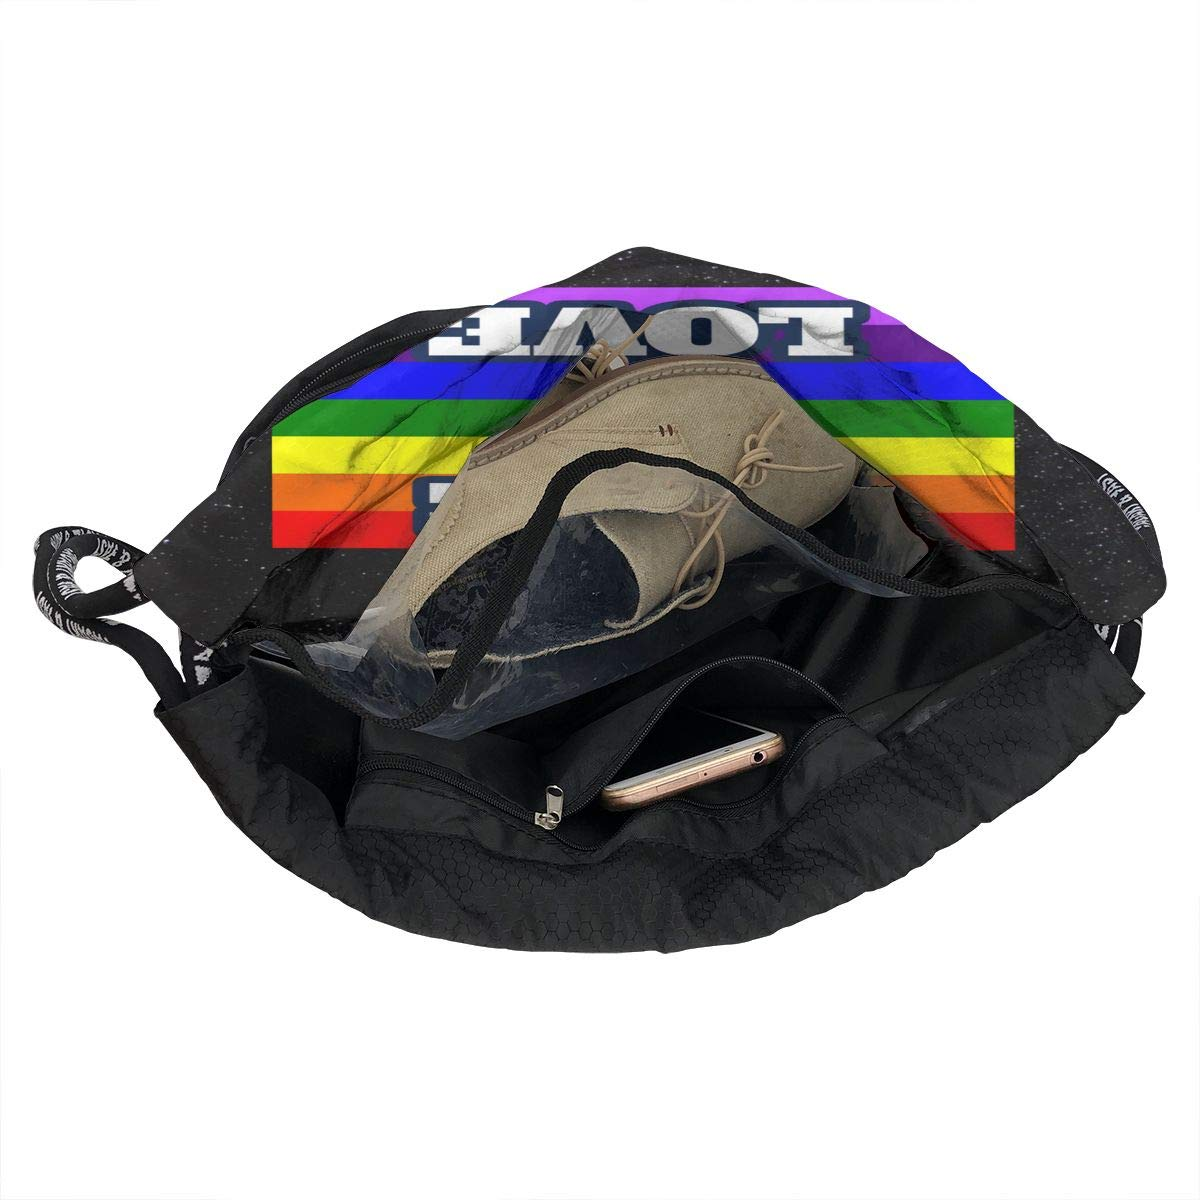 Xdfcvmalkwrj Unisex Mens Woman Love is Love Durable Beam Backpack Gift